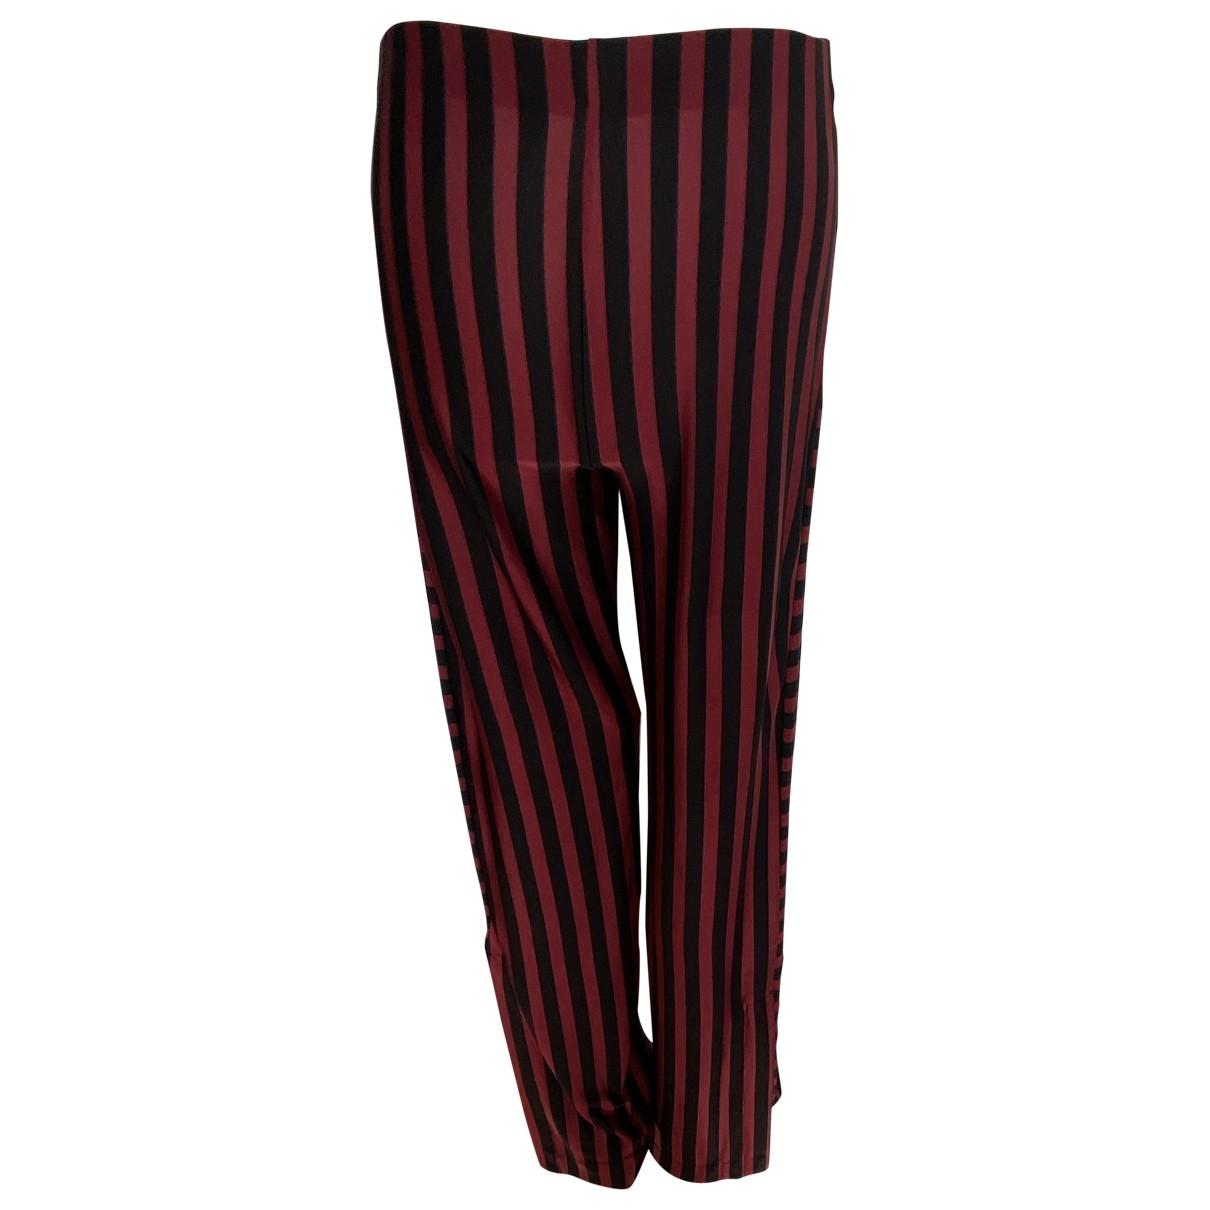 Zara \N Multicolour Trousers for Women S International